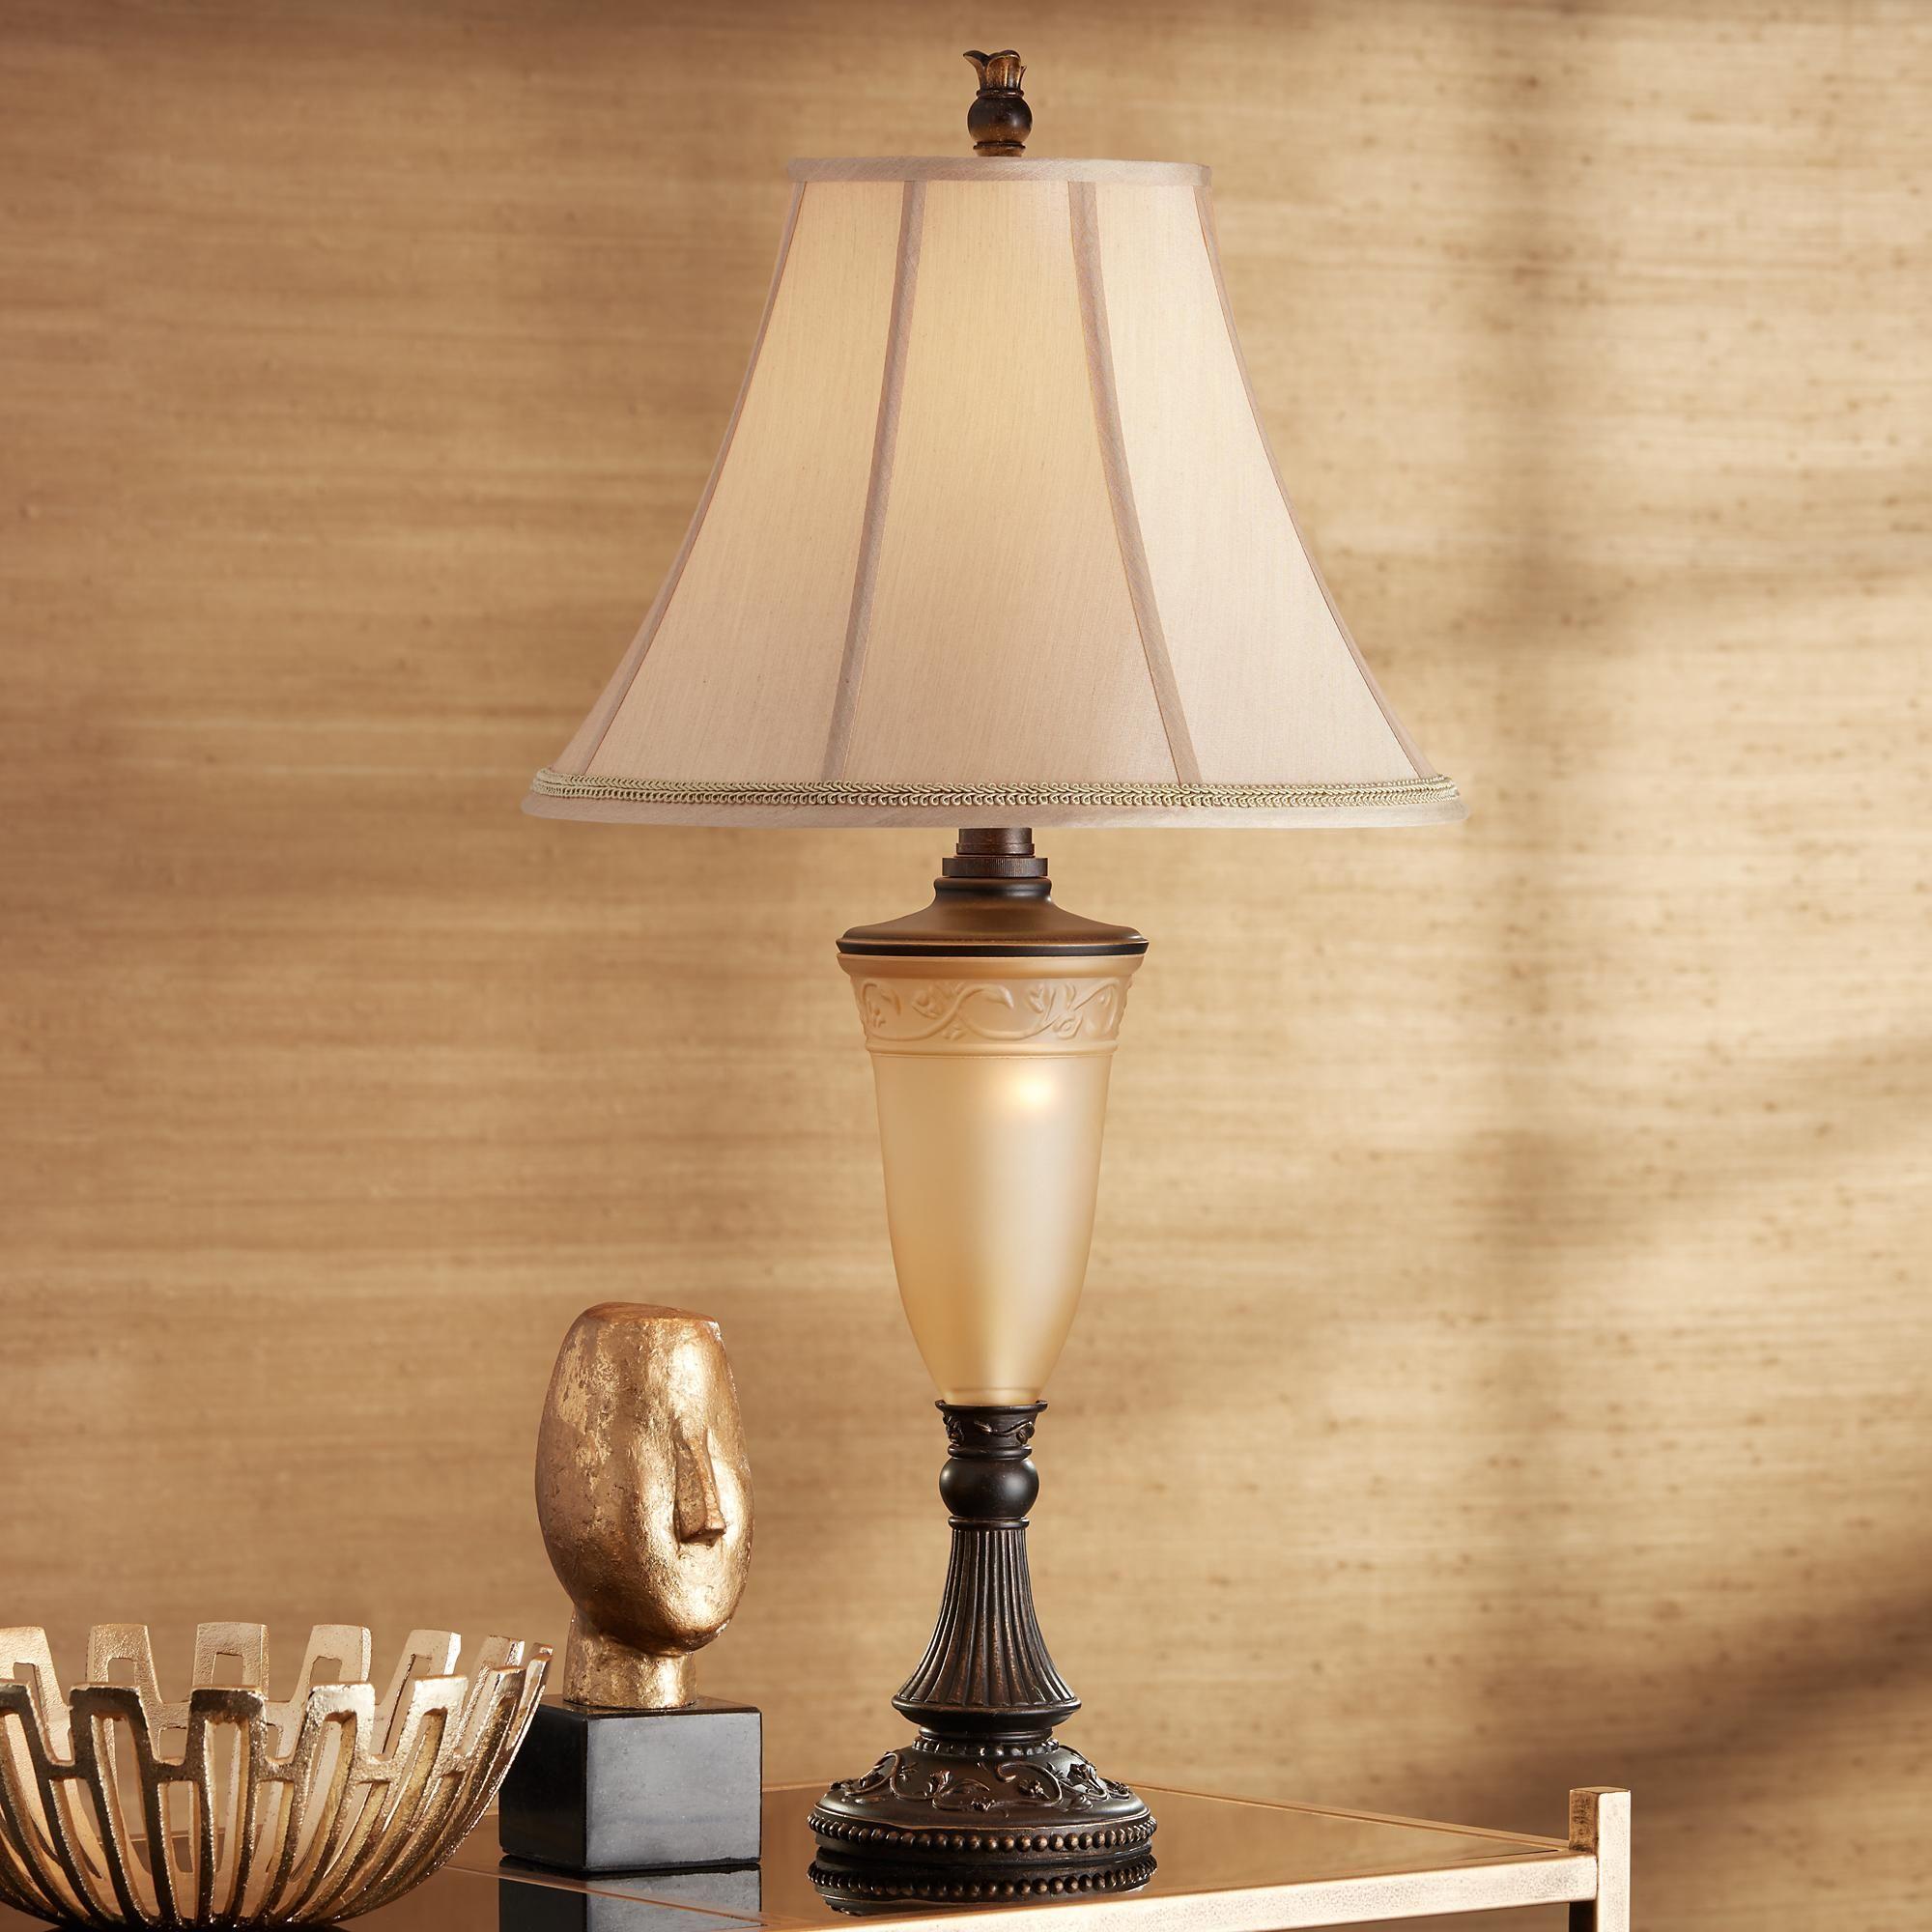 Table Lamps Kathy Ireland Sorrento Night Light Table Lamp In 2020 Night Light Lamp Table Lamp Lamp